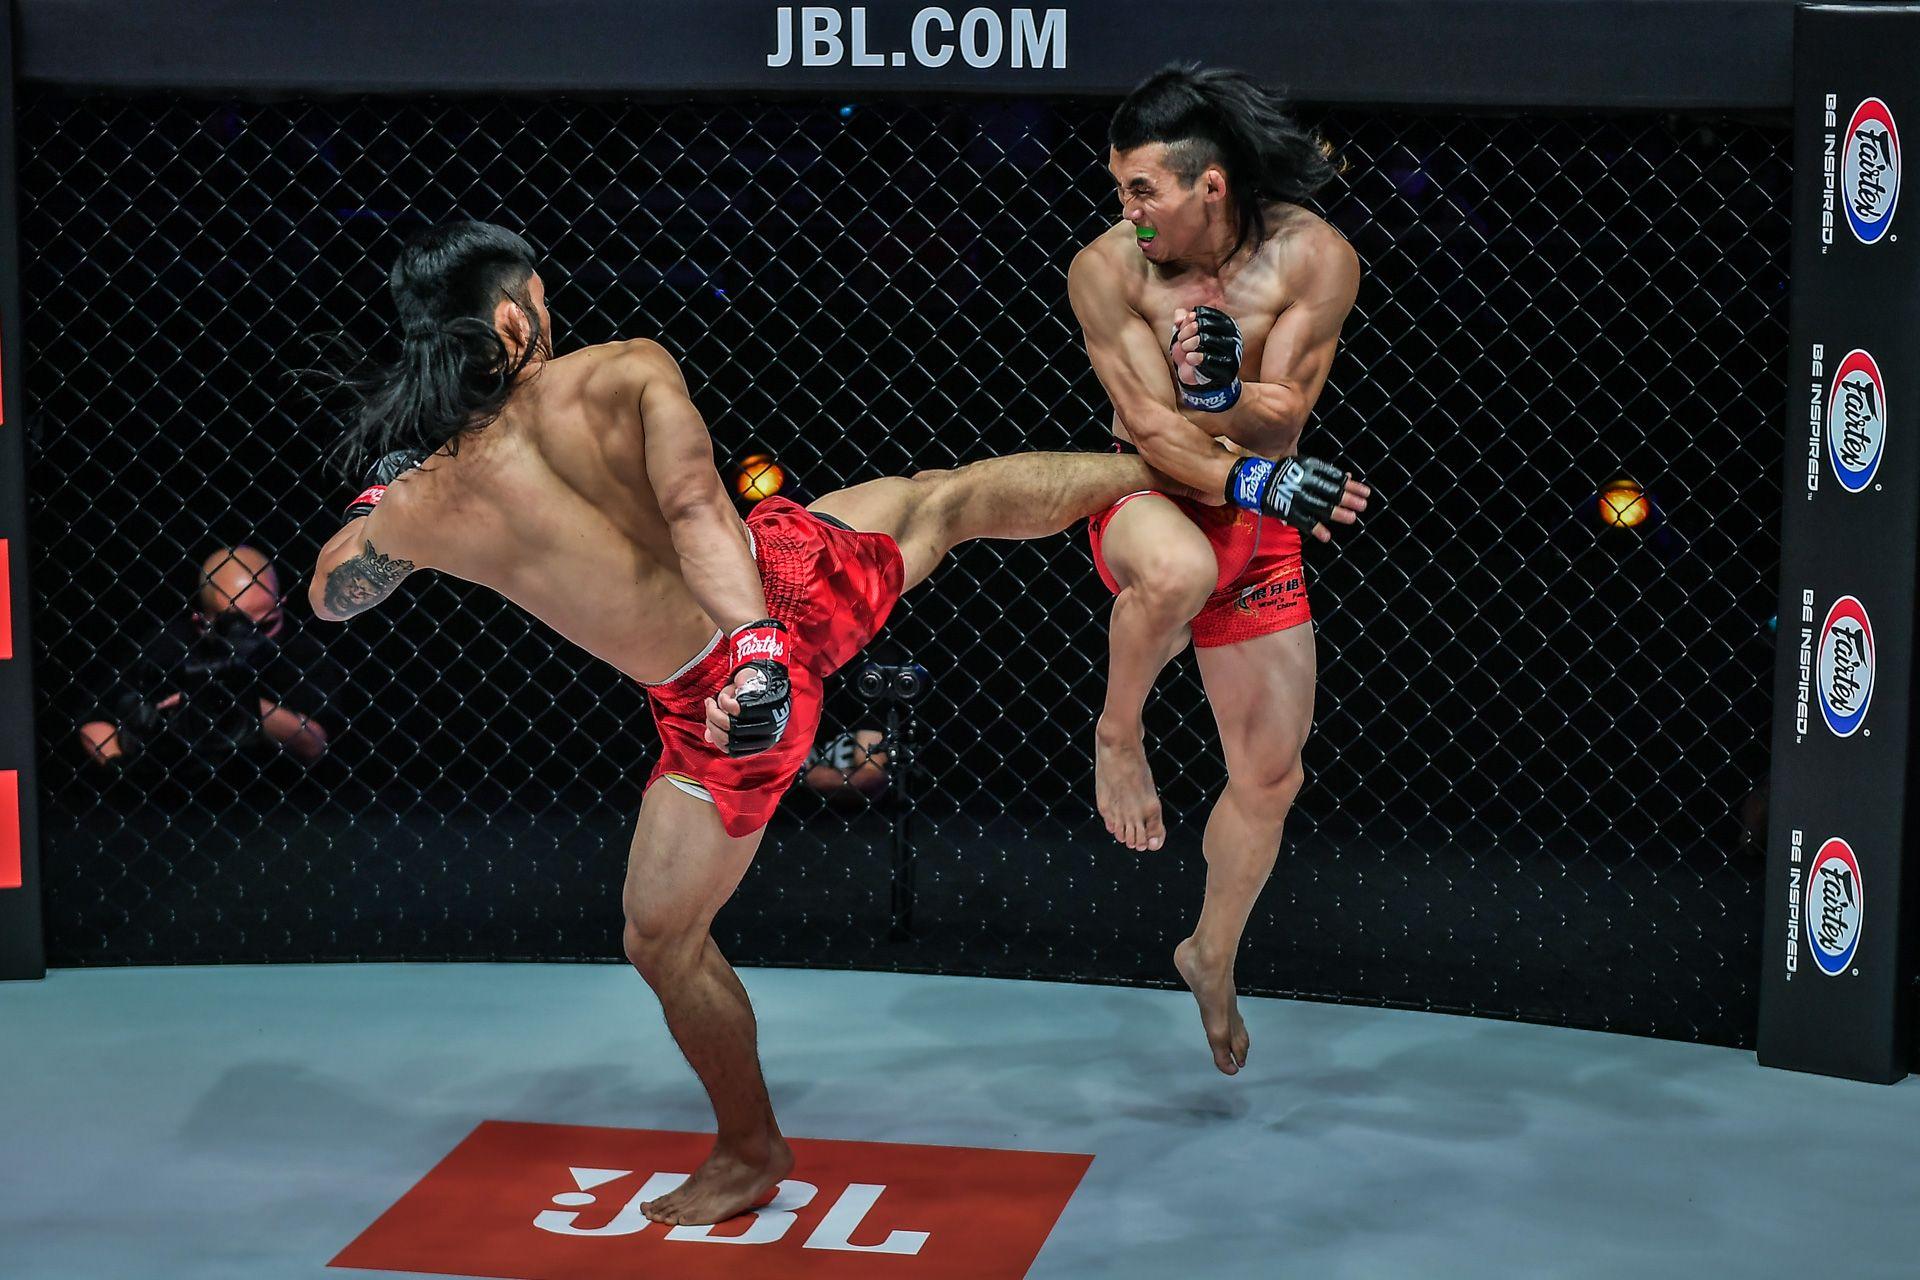 ONE-Revolution-Adiwang-body-kick-to-Hexigetu ONE: Revolution: Lito Adiwang shows no rust, stops Hexigetu's streak Mixed Martial Arts News ONE Championship  - philippine sports news